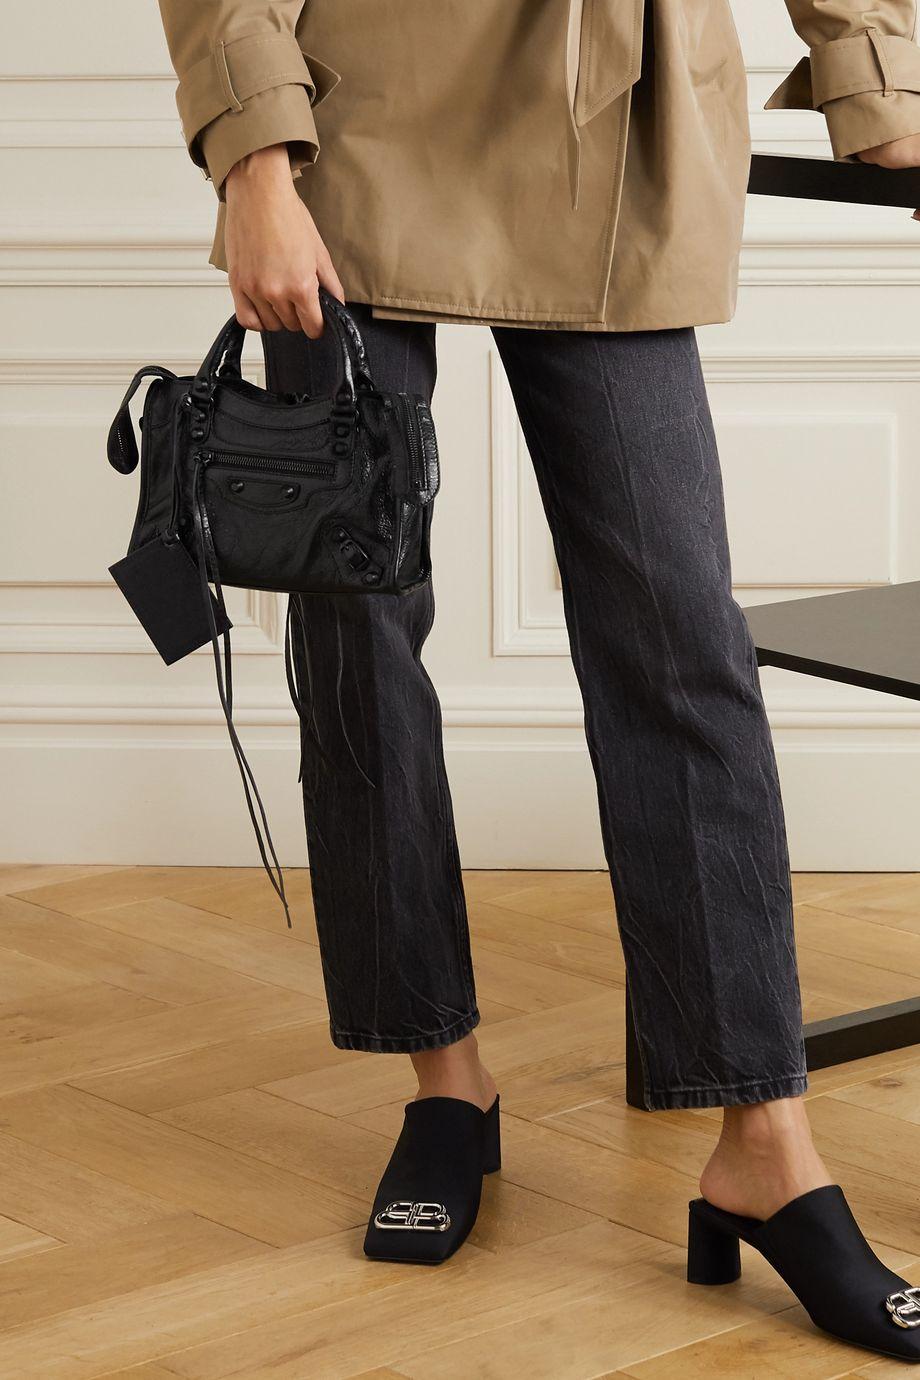 Balenciaga Classic City mini textured-leather tote